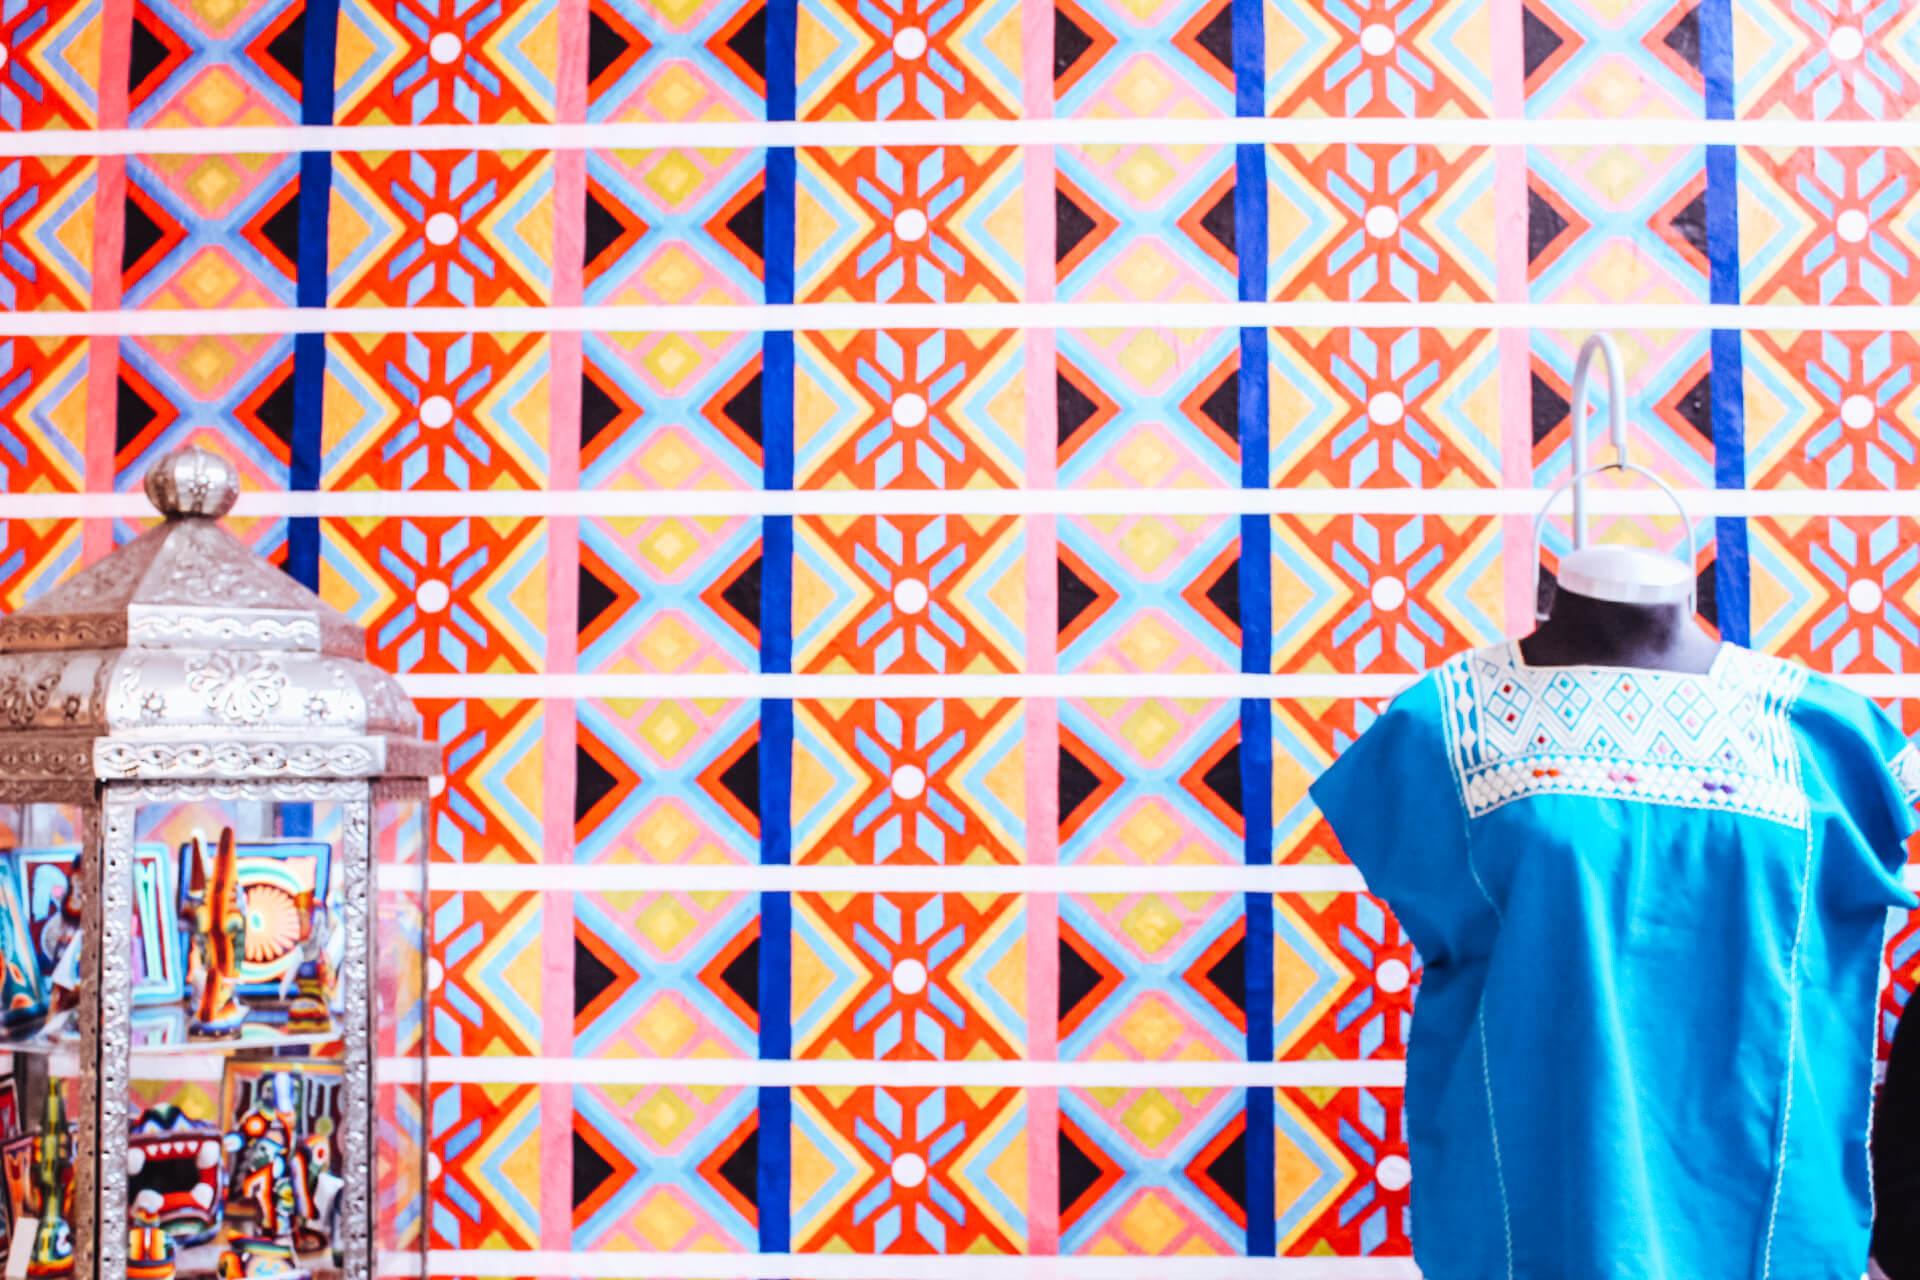 Patterned Gift Shop Wall   Frida Kahlo Museum